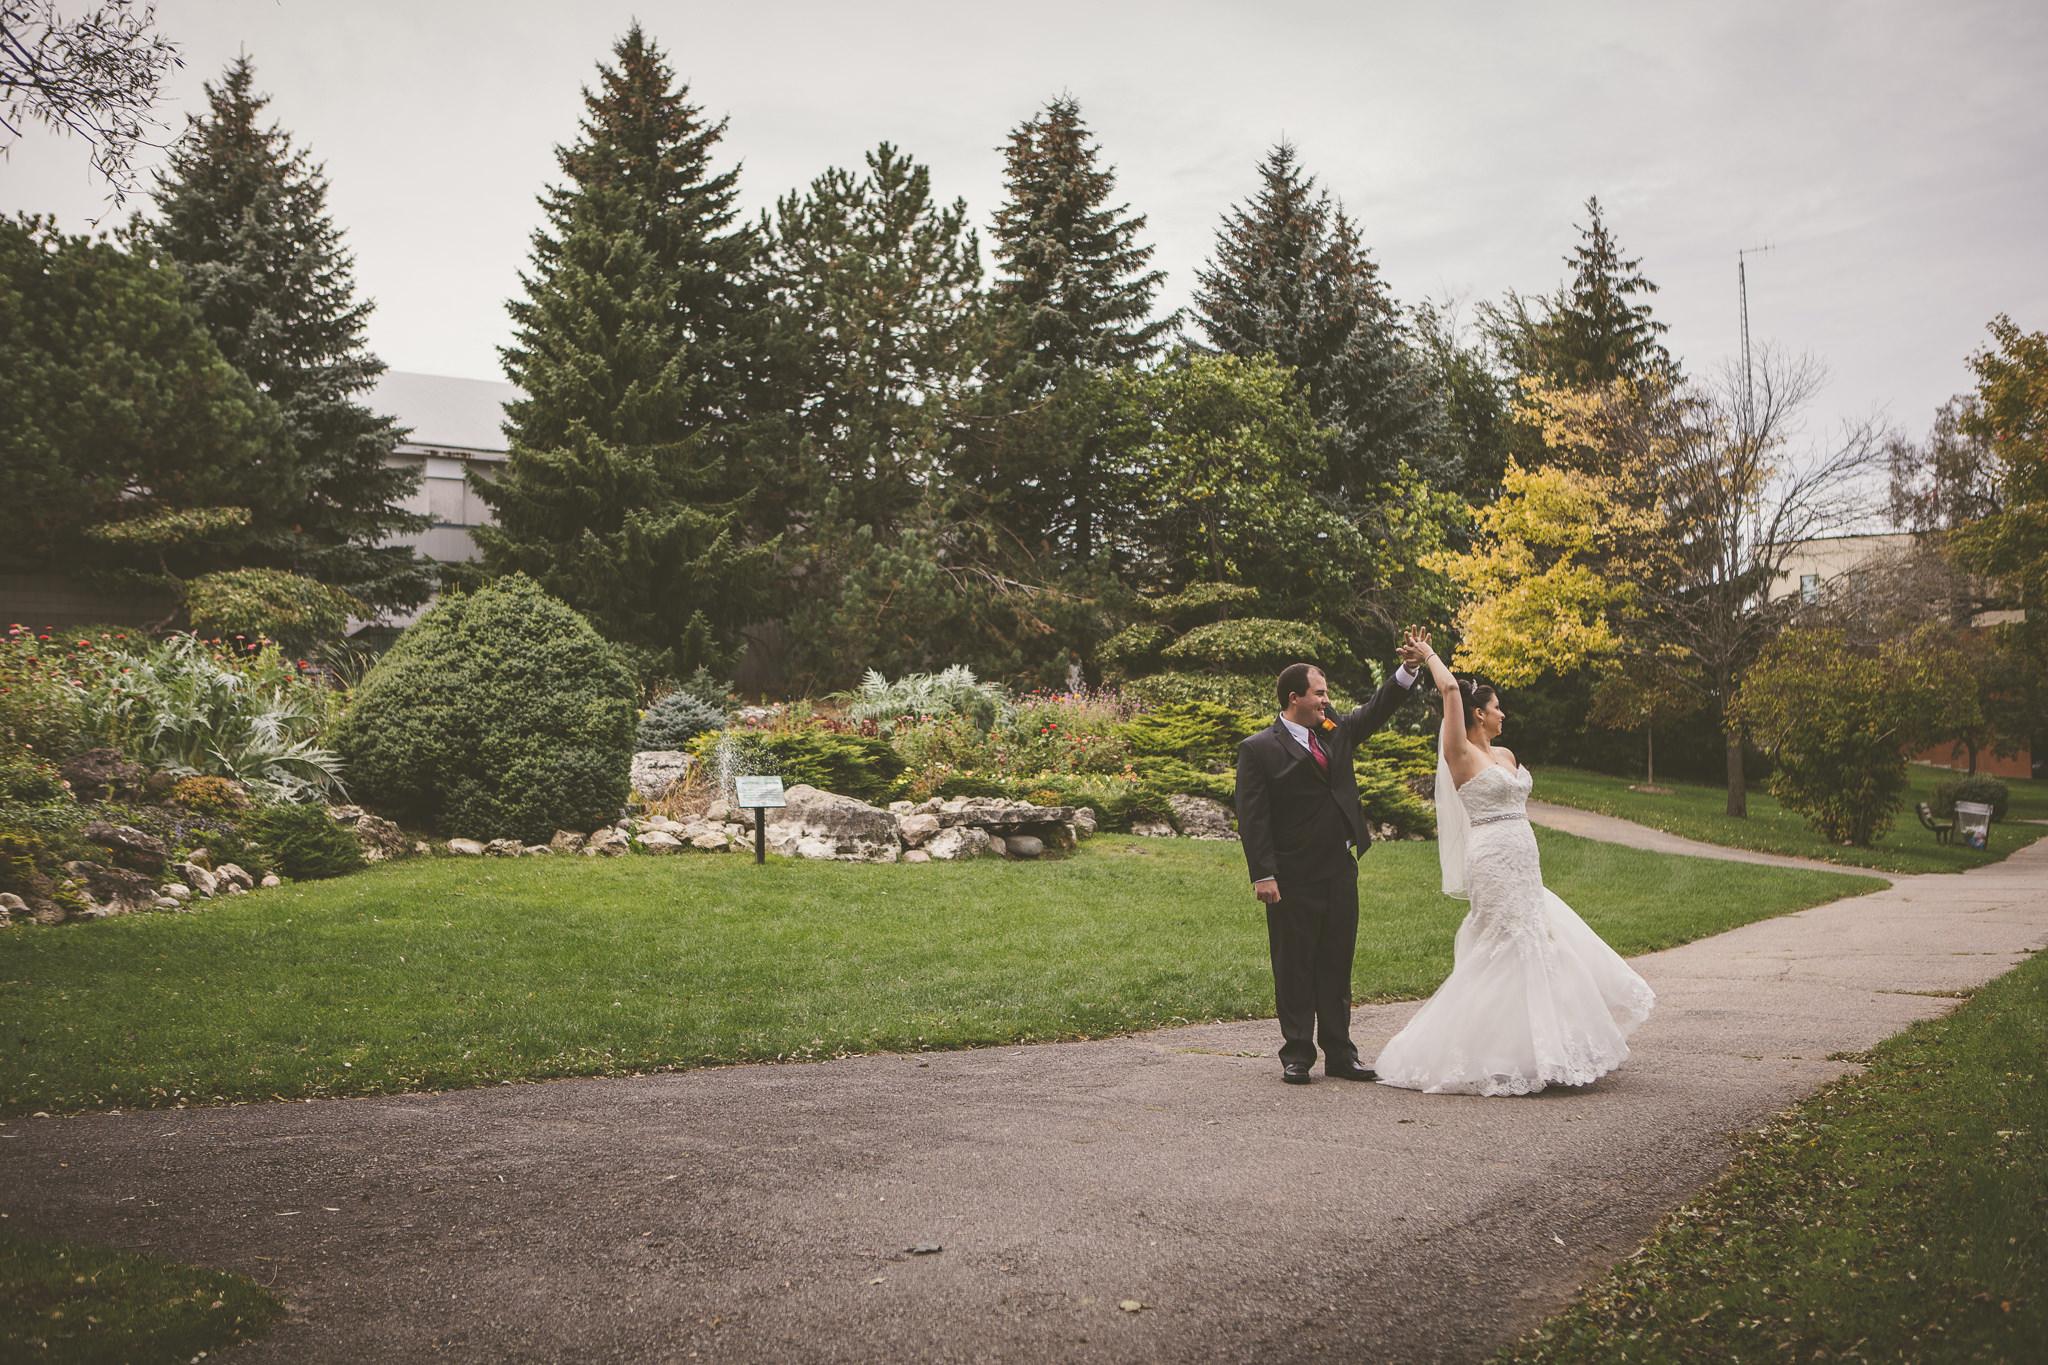 deer creek banquet facility wedding photos 201 - Deer Creek Wedding Photos